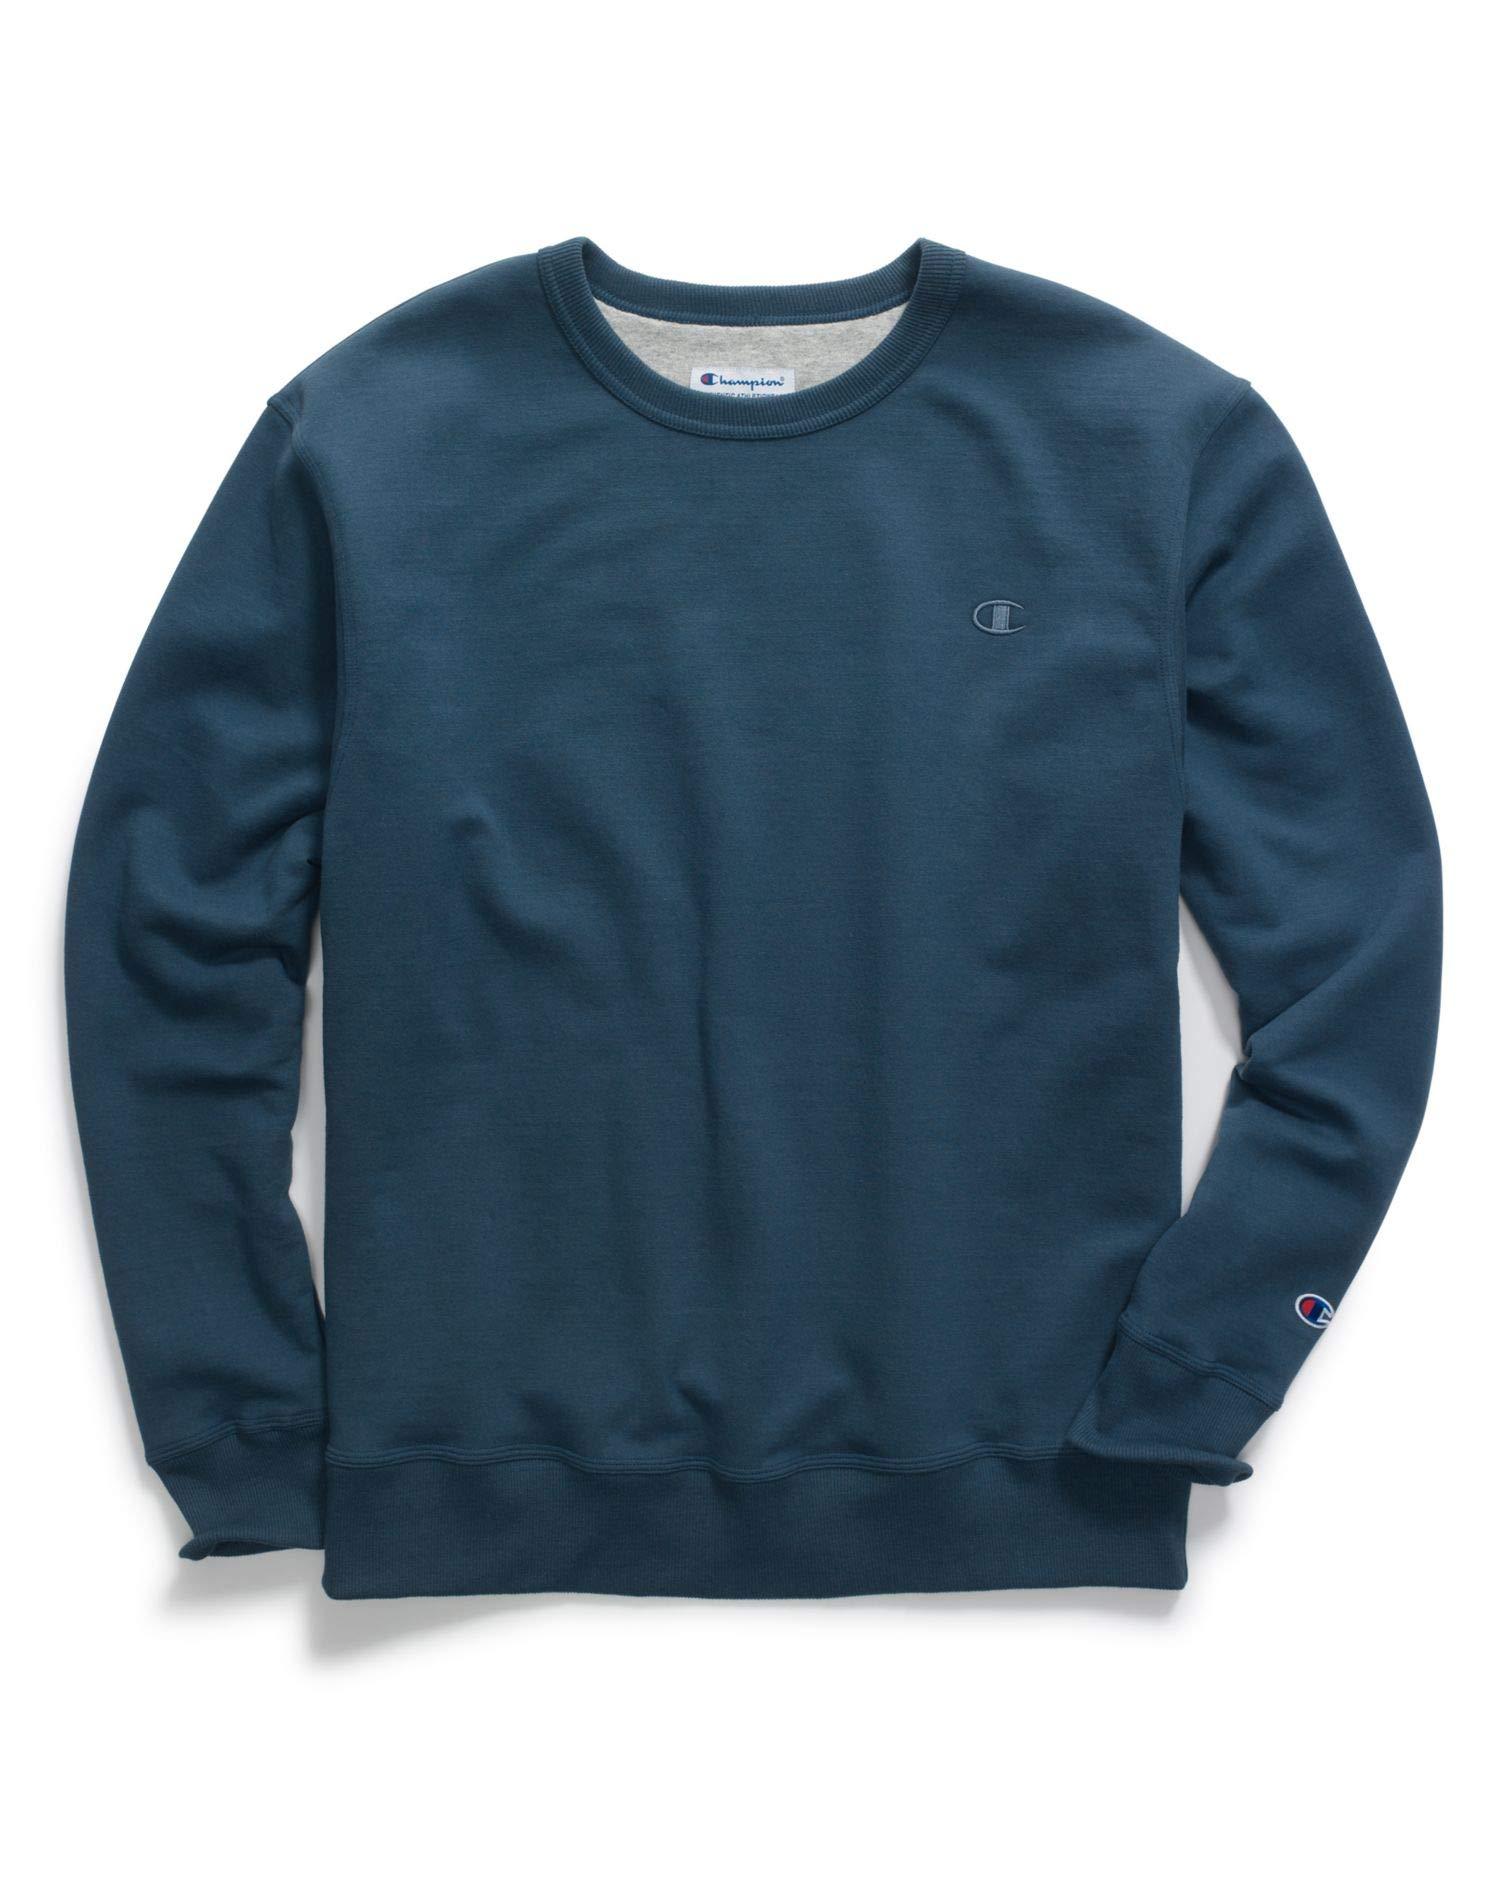 Champion Men's Powerblend Fleece Pullover Crew, Juniper Blue, Size - S by Champion (Image #1)